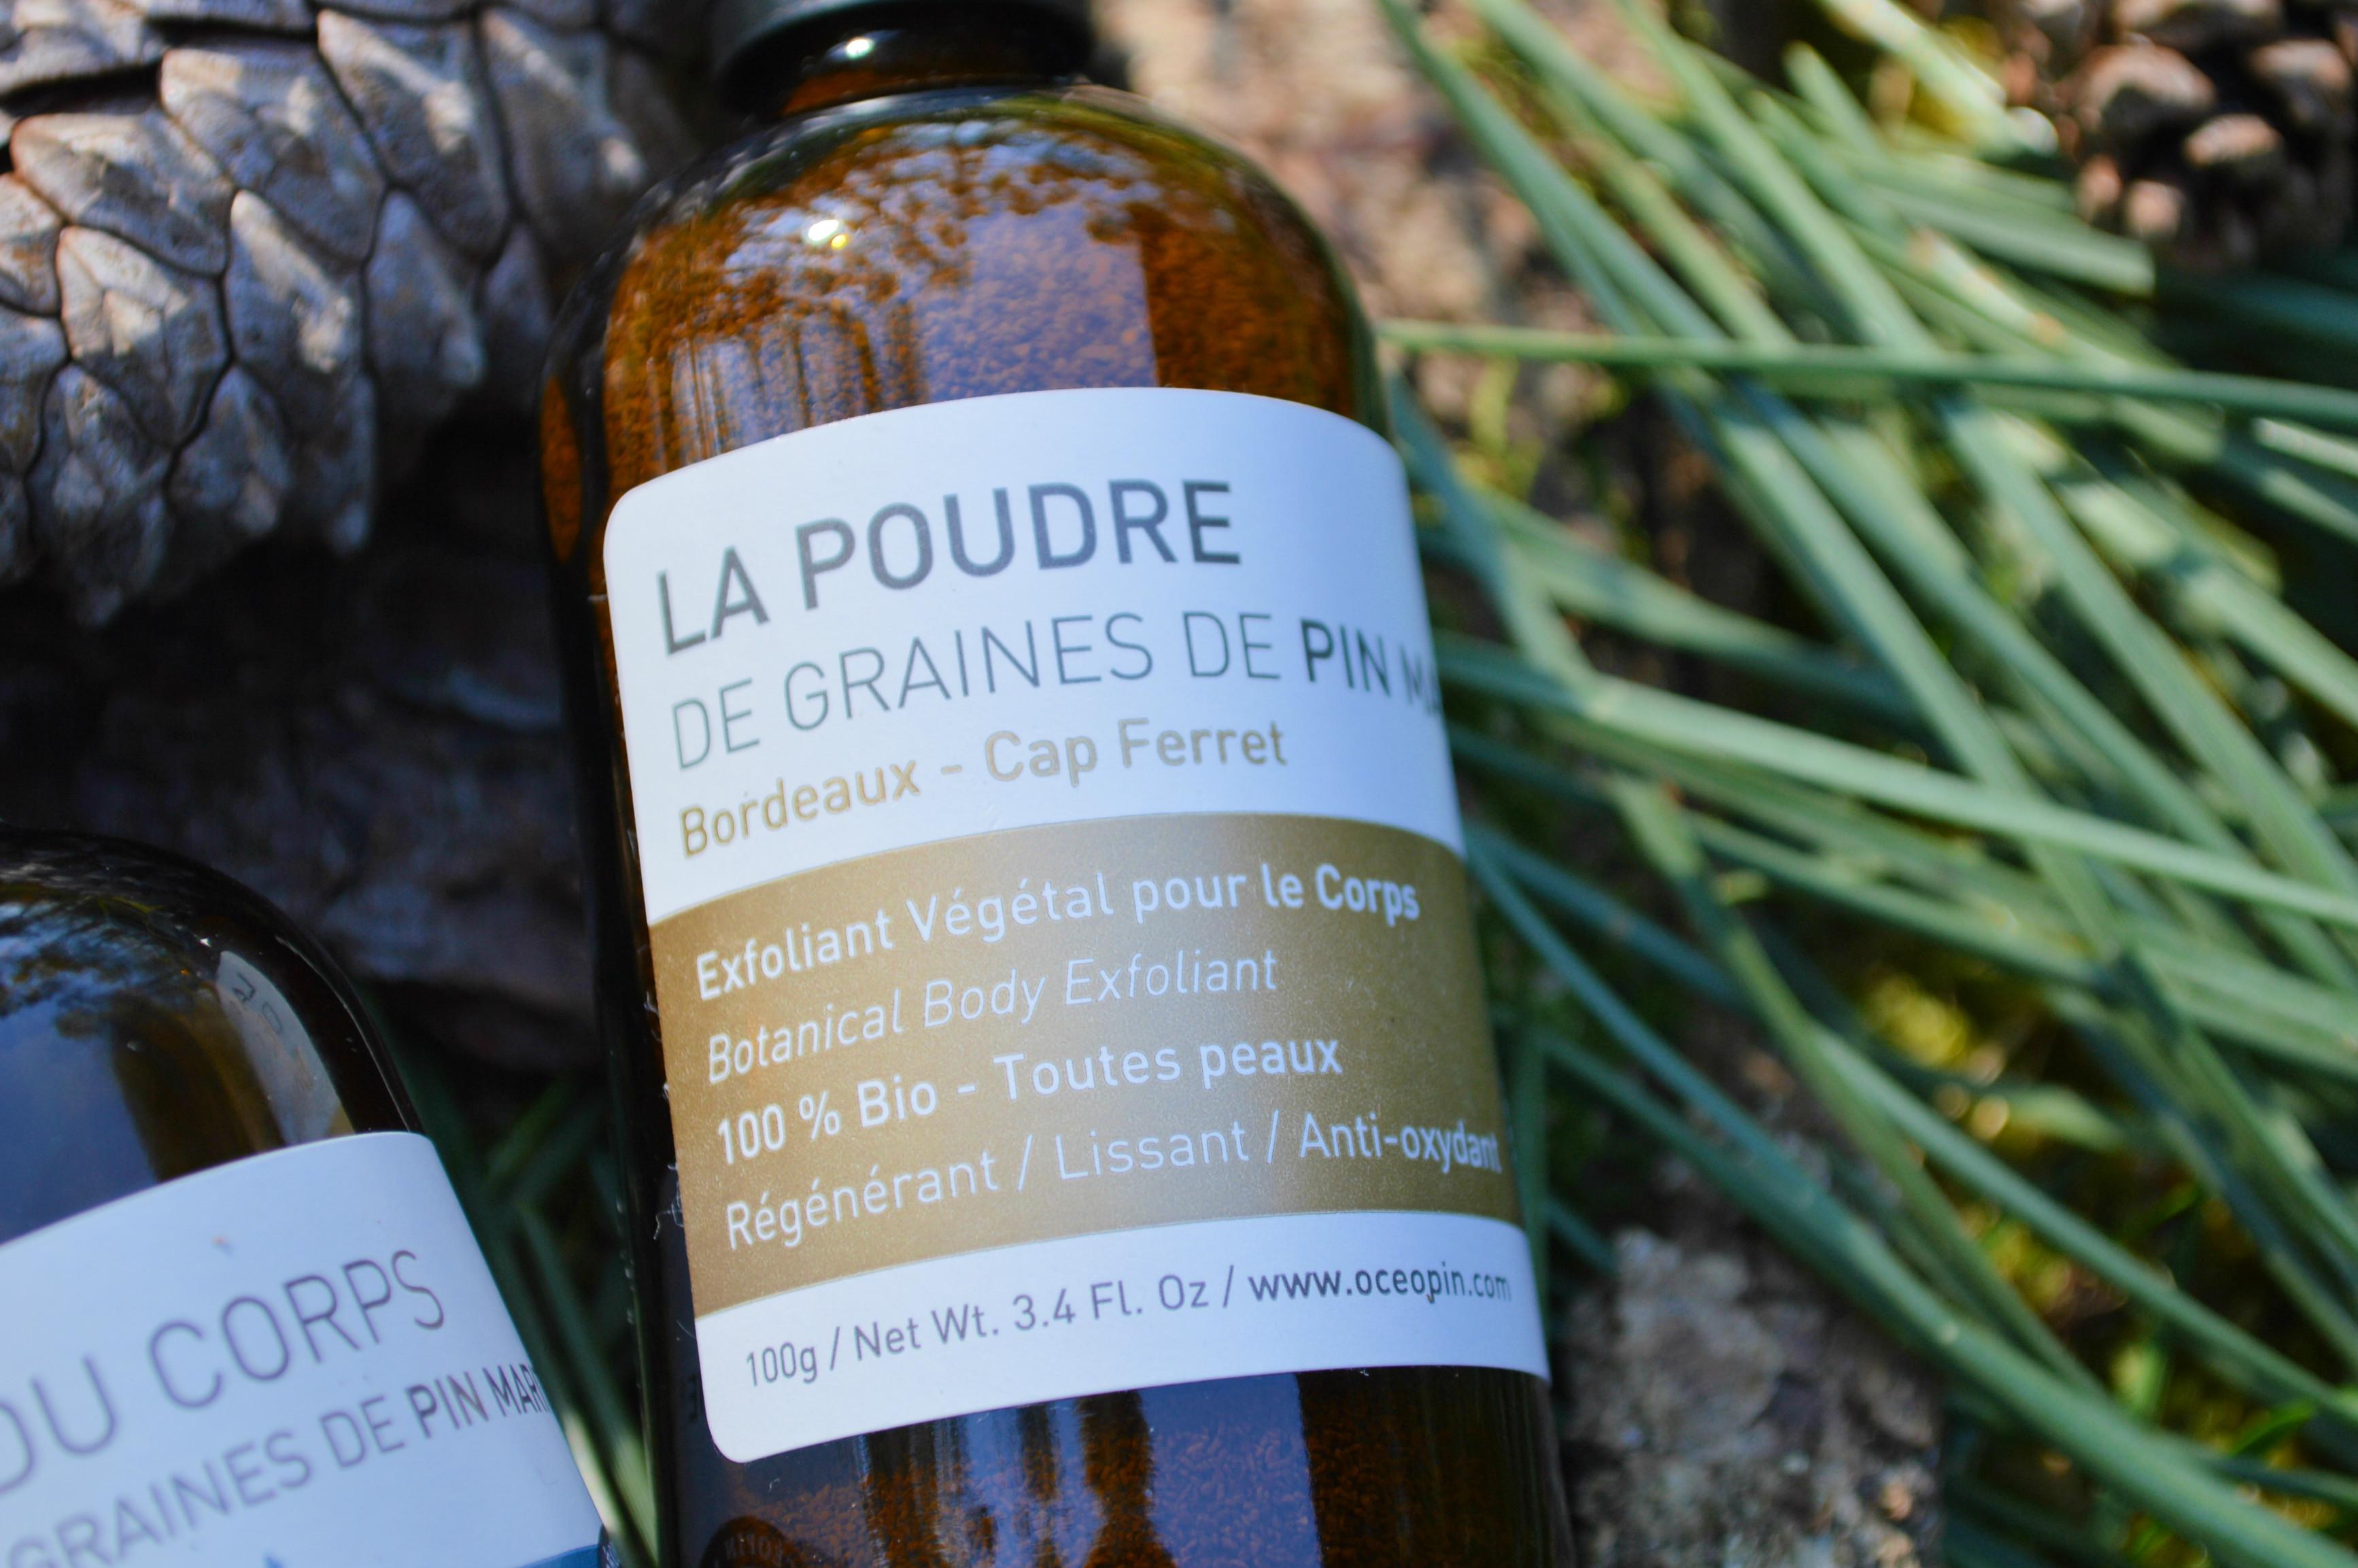 poudre exfoliante graines de pin maritime Océopin